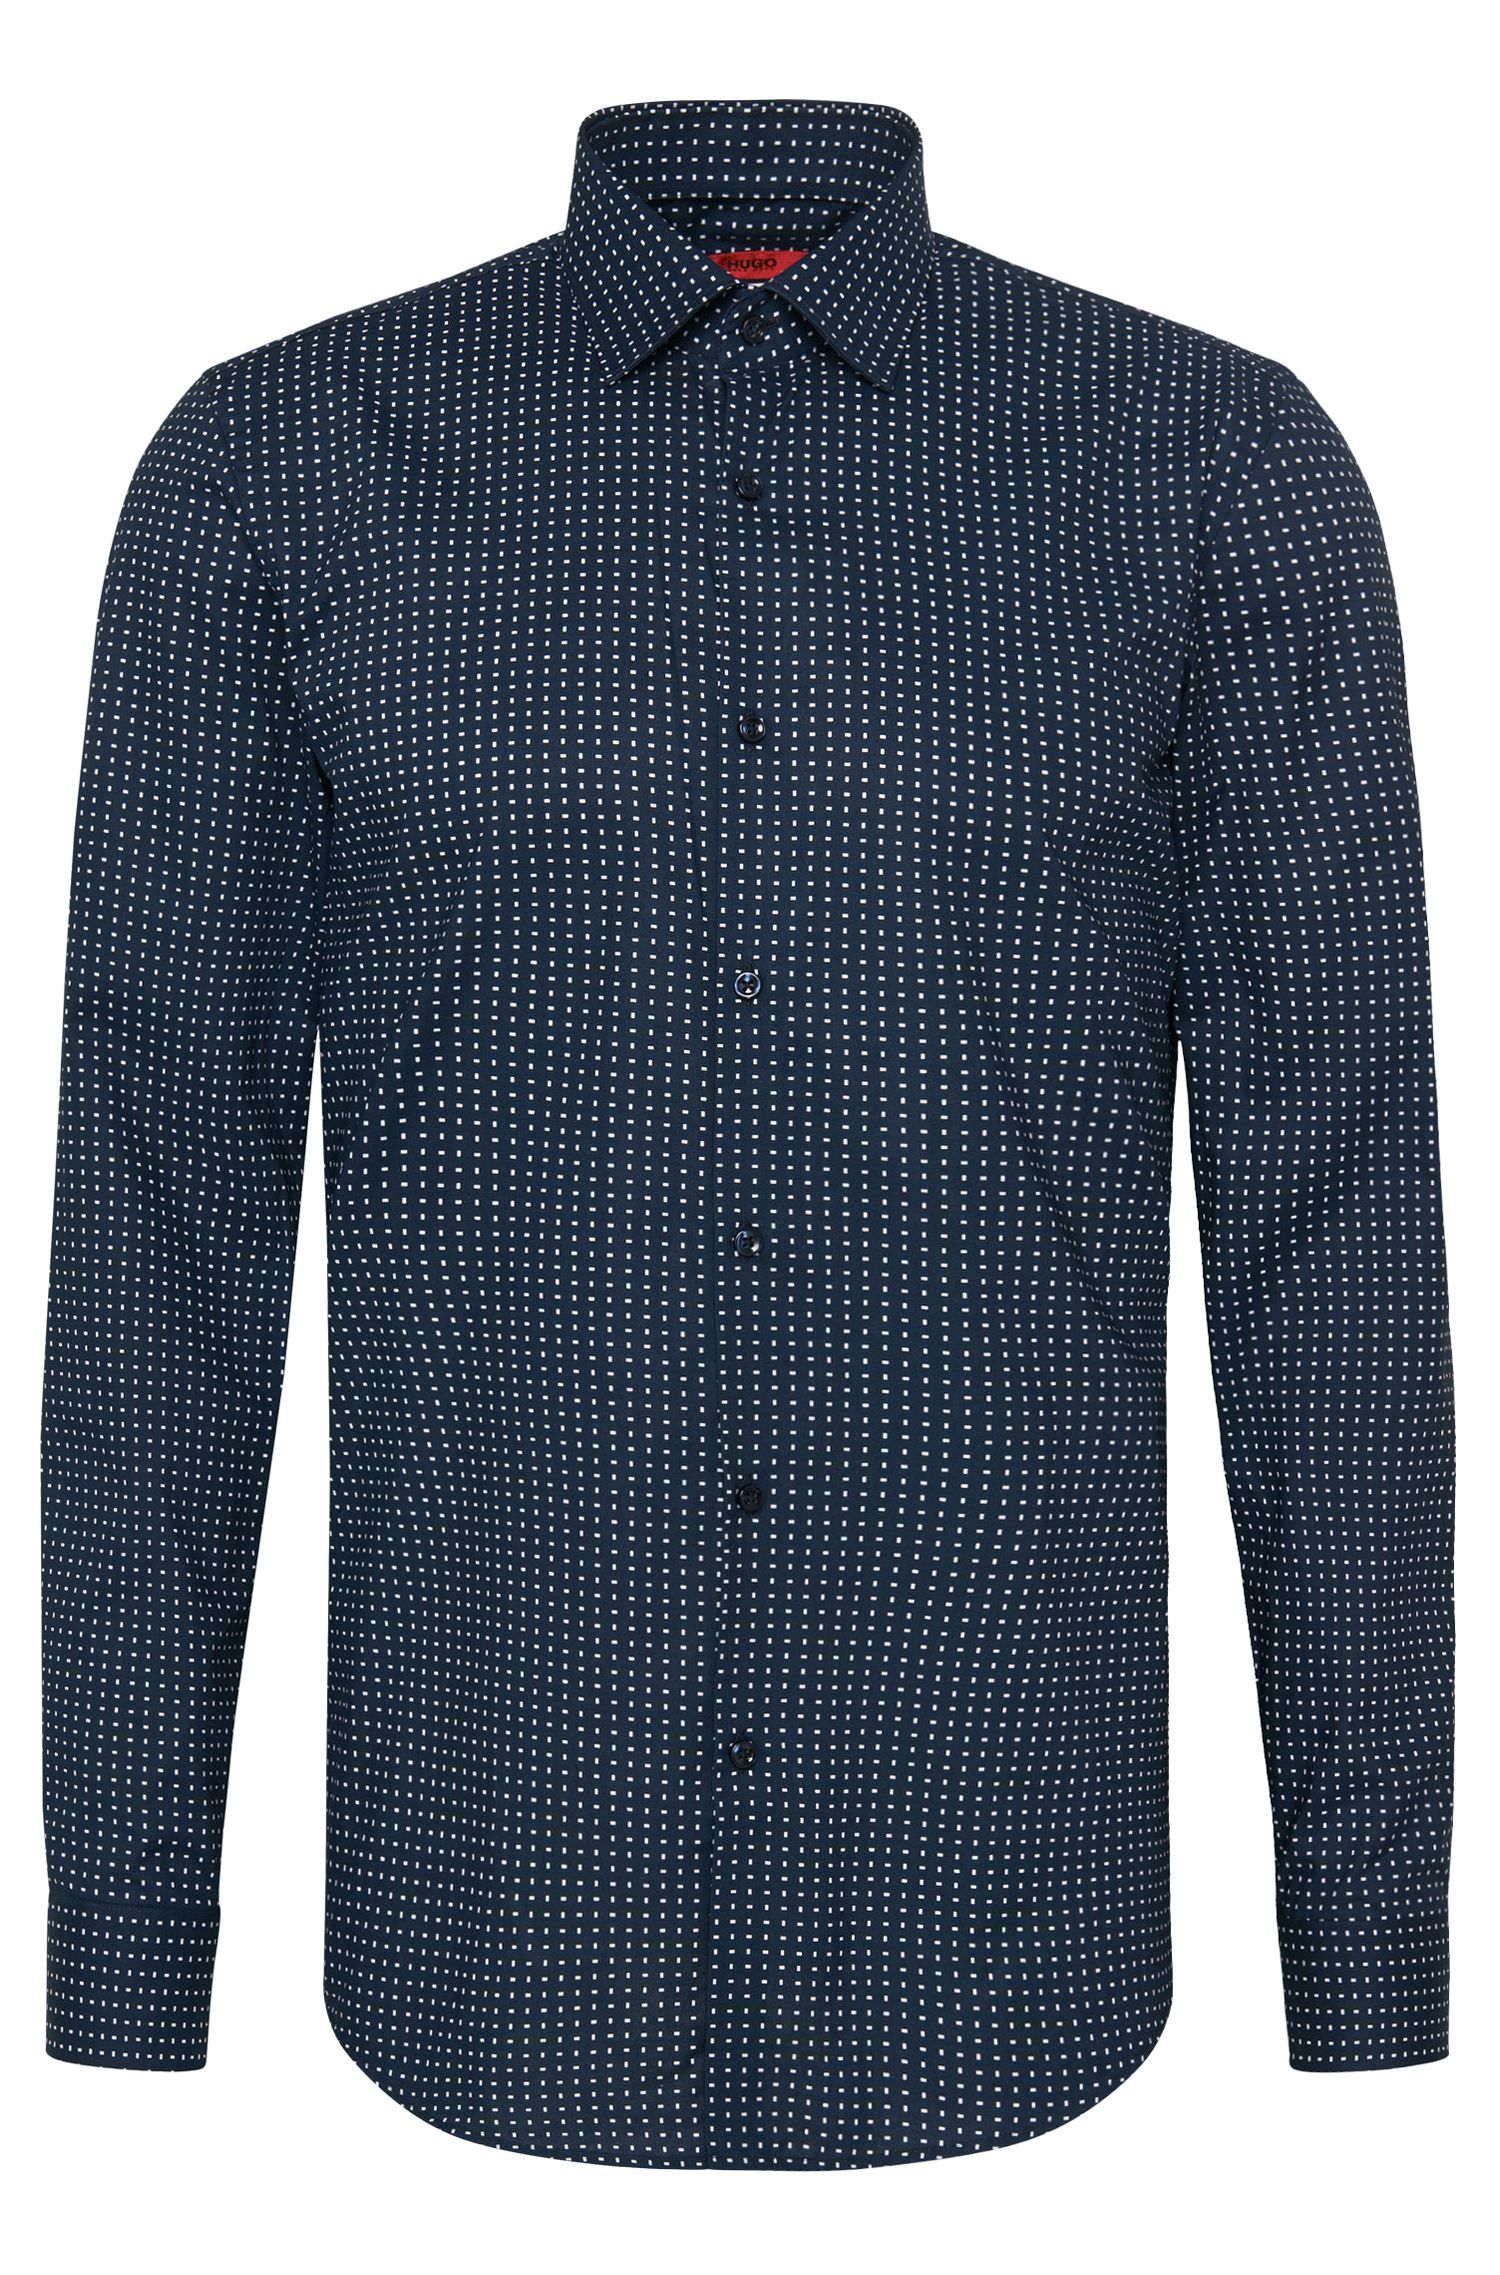 Gemustertes Slim-Fit Hemd aus Baumwolle: 'C-Jenno'